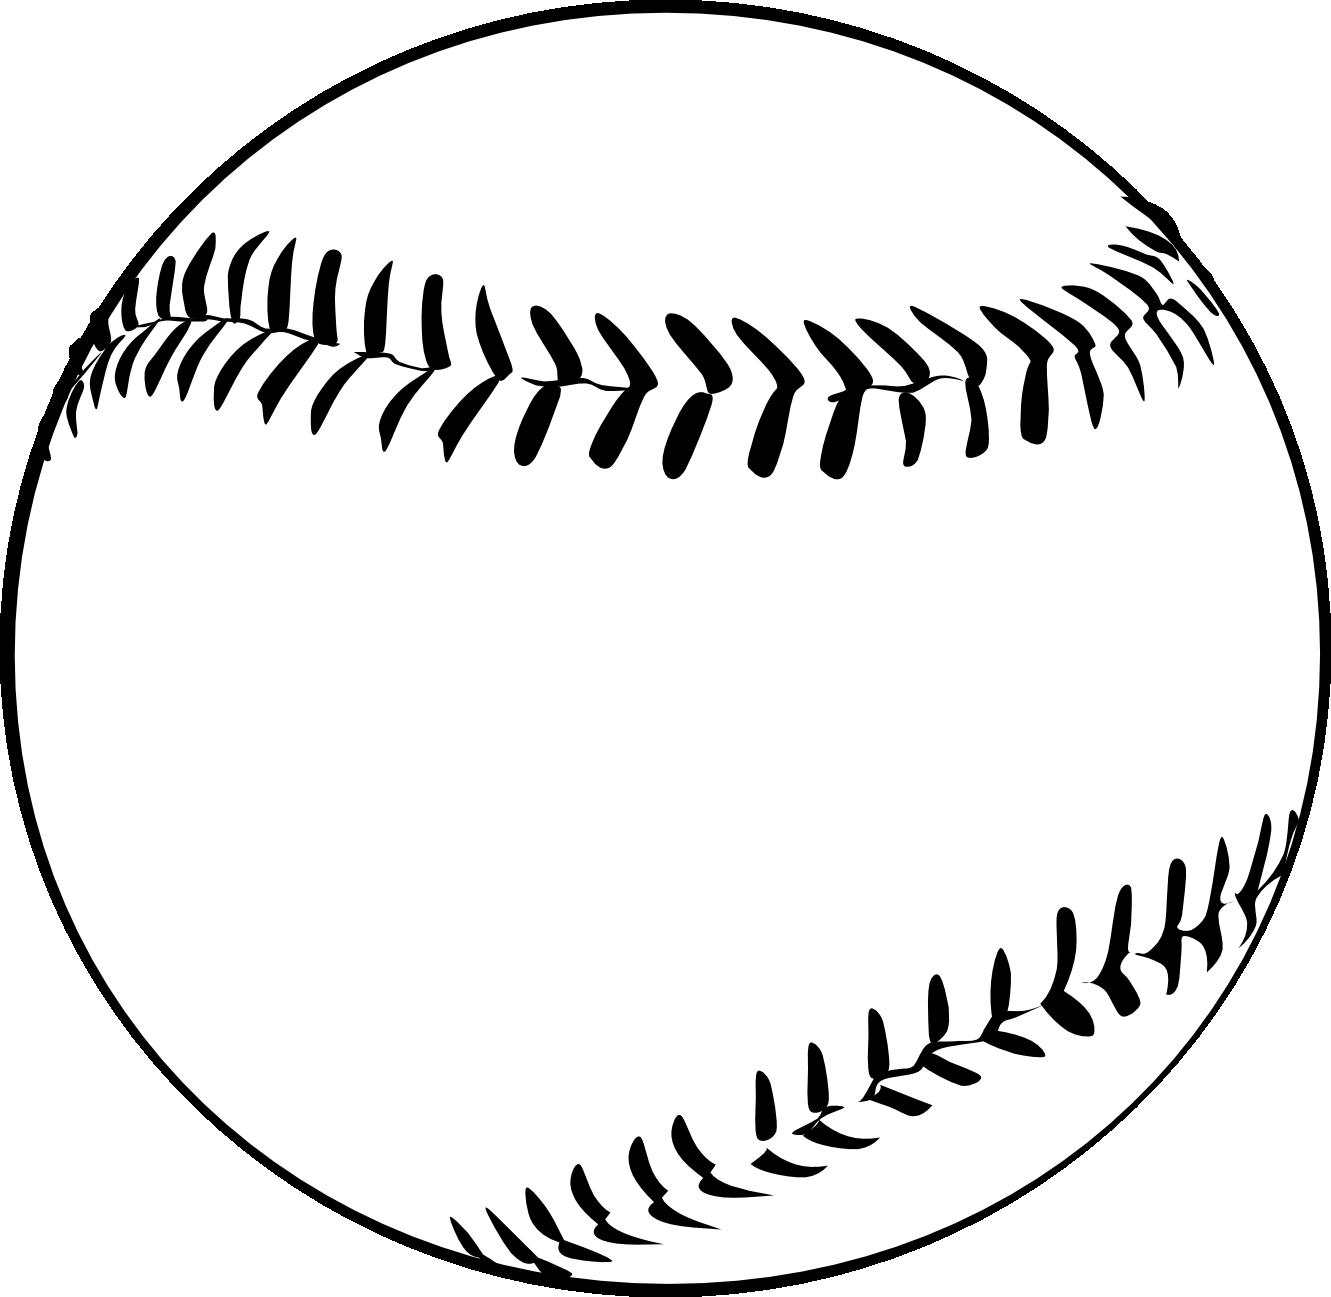 baseball clipart black and wh - Baseball Clipart Black And White